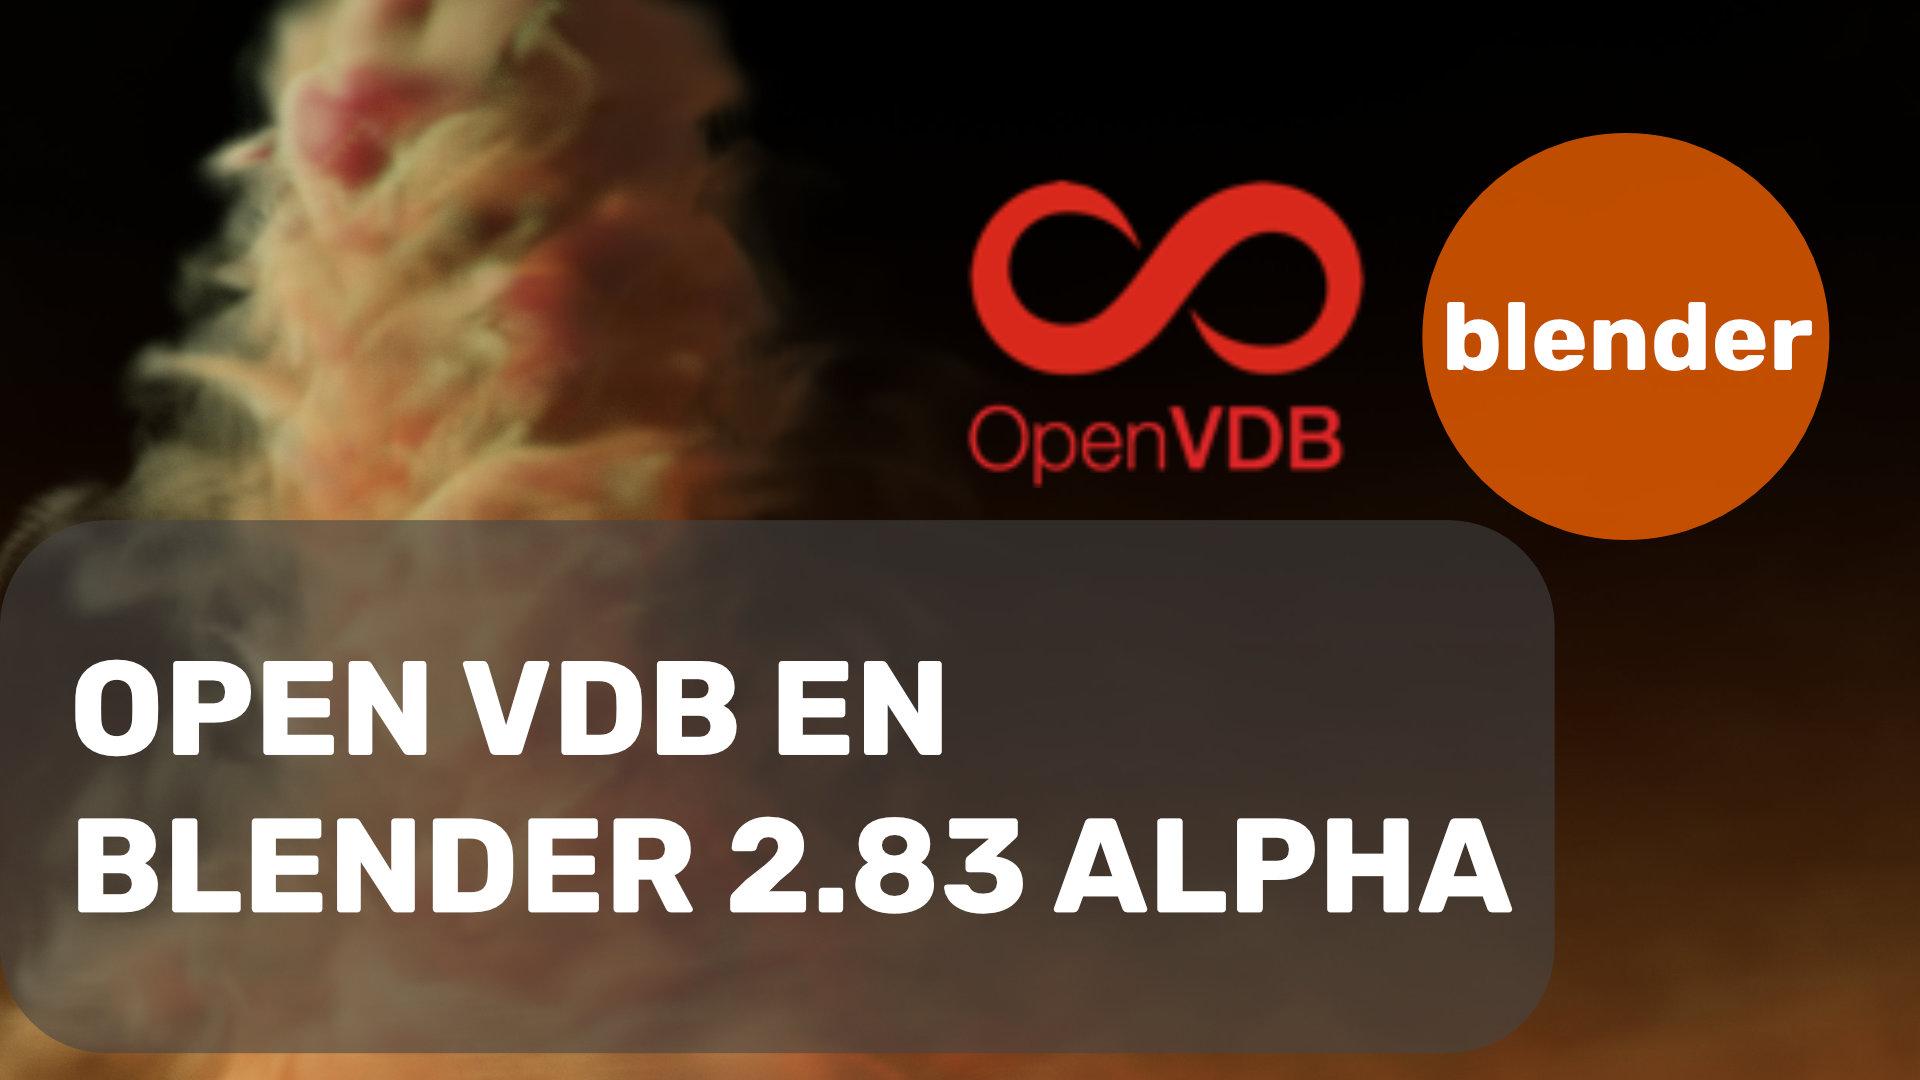 Open VDB en Blender 2.83 alpha